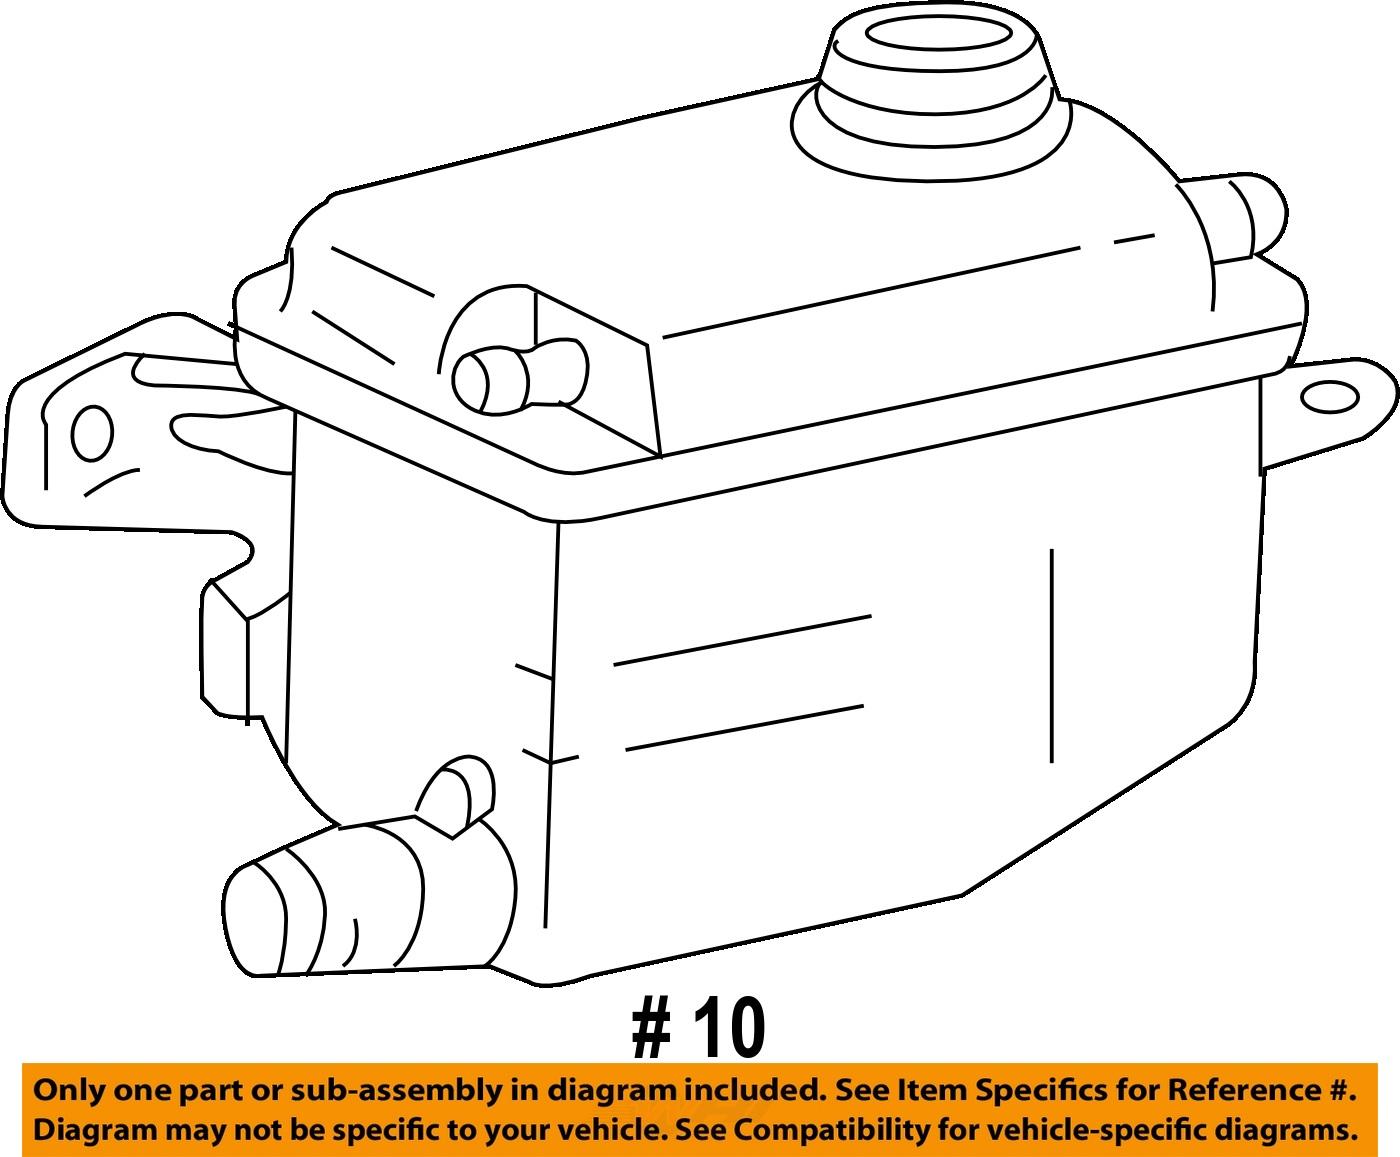 2002 ford taurus cooling system diagram ae111 wiring 99 miata service manual get free image